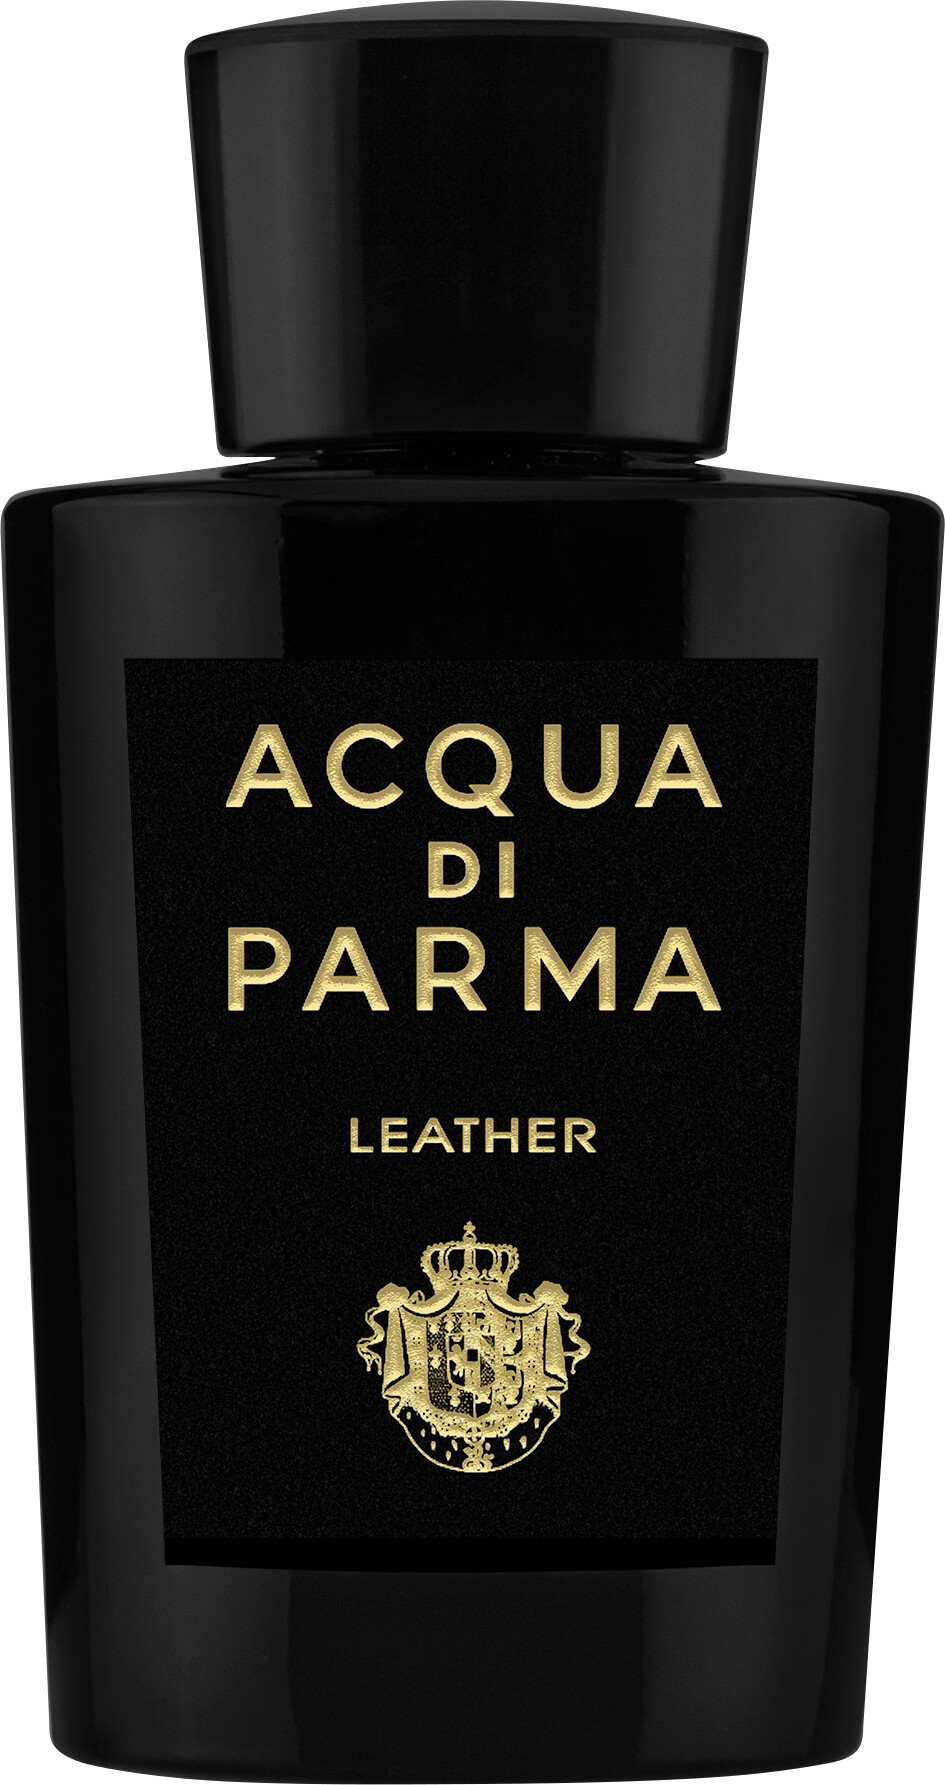 Acqua Di Parma Leather Eau De Parfum Spray